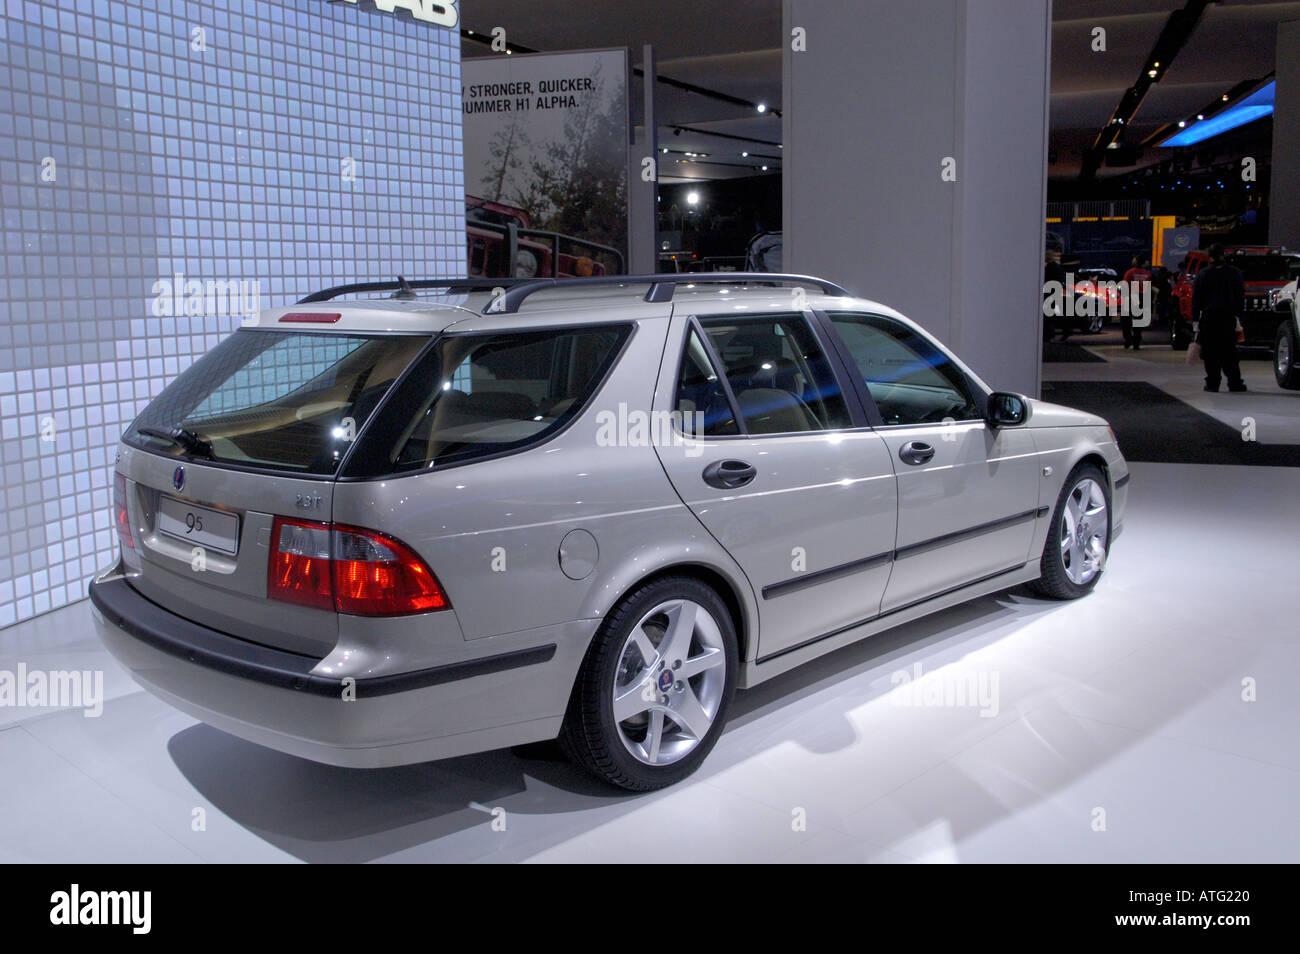 2005 Saab 9 5 Wagon At The North American International Auto Show